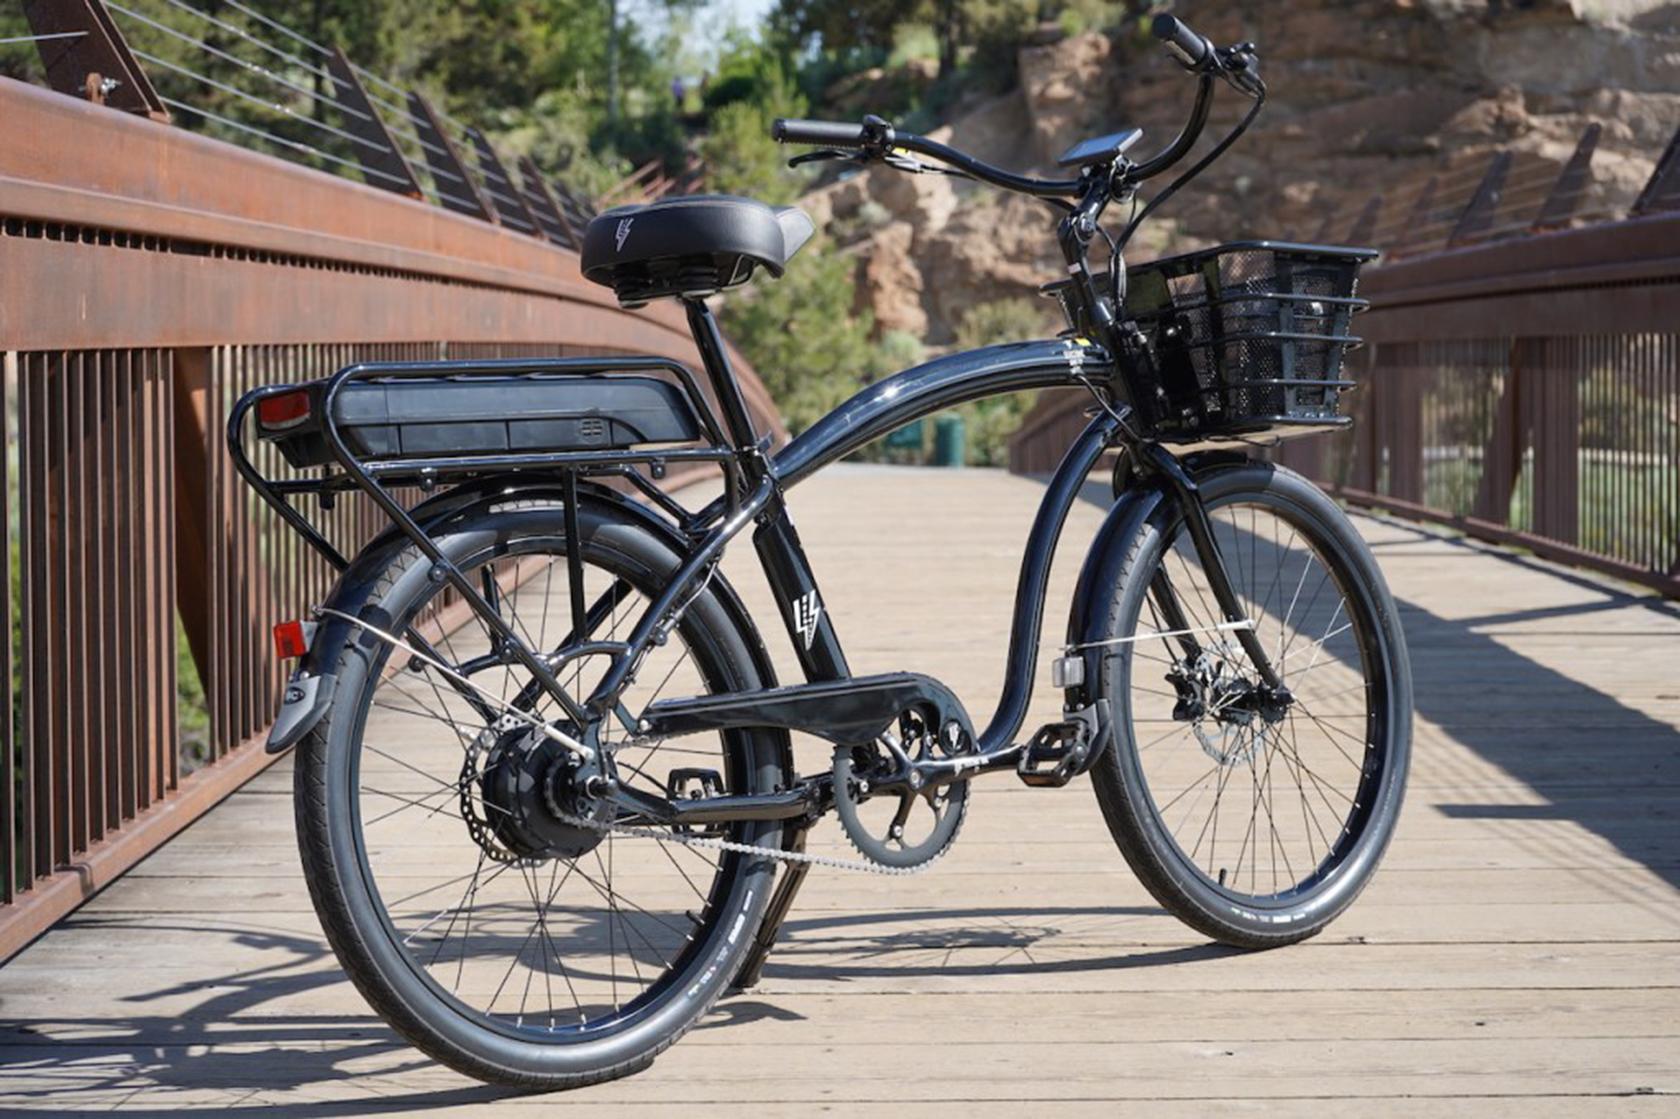 Electric Bike Company Model C model review